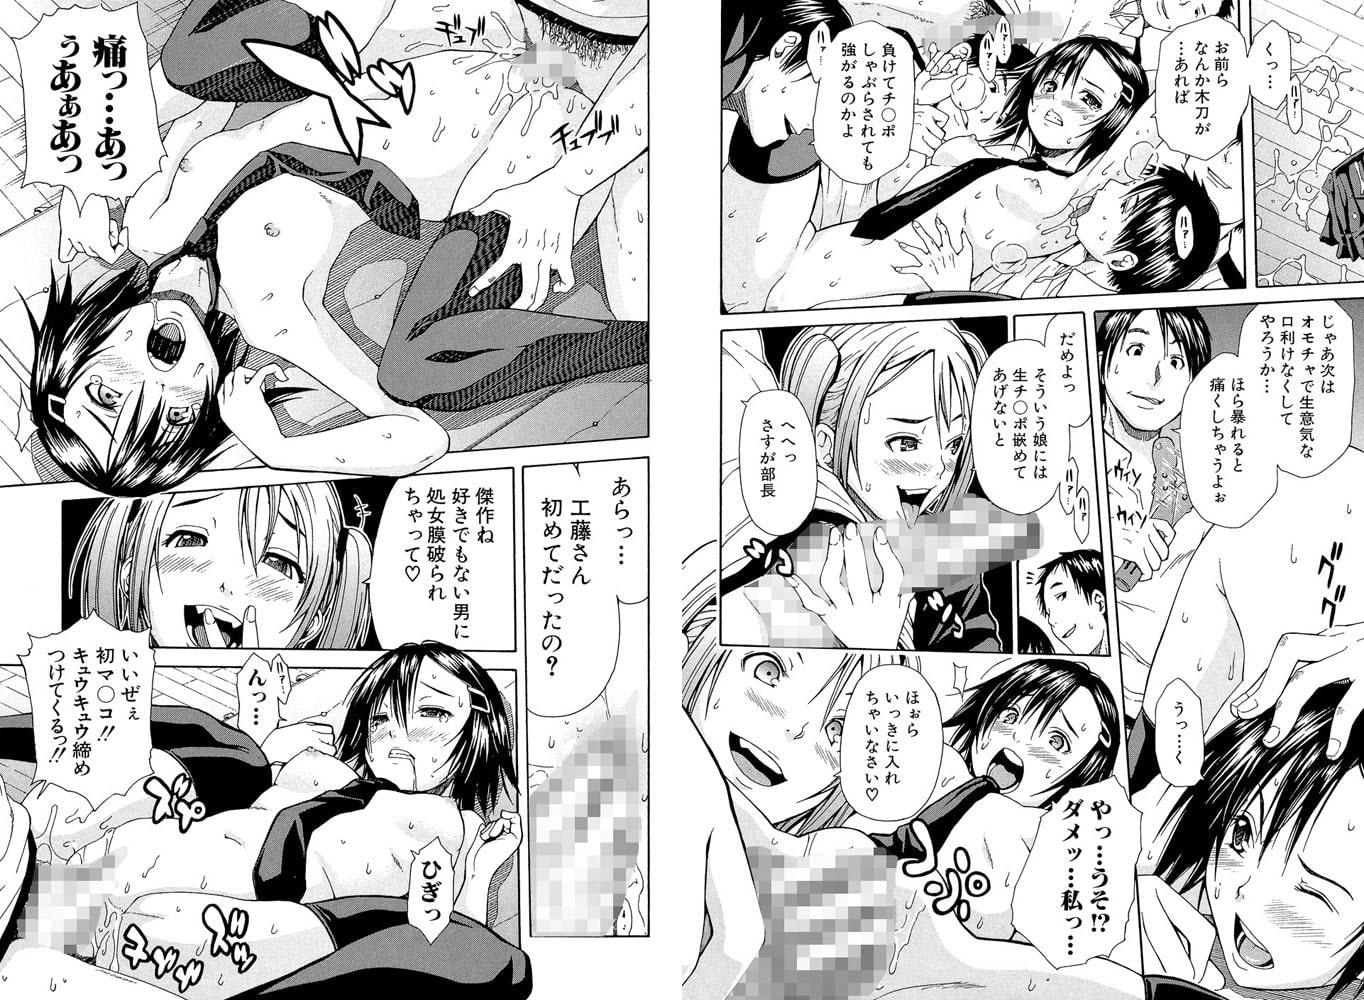 【JK】千要よゆち先生2冊パック(202011)